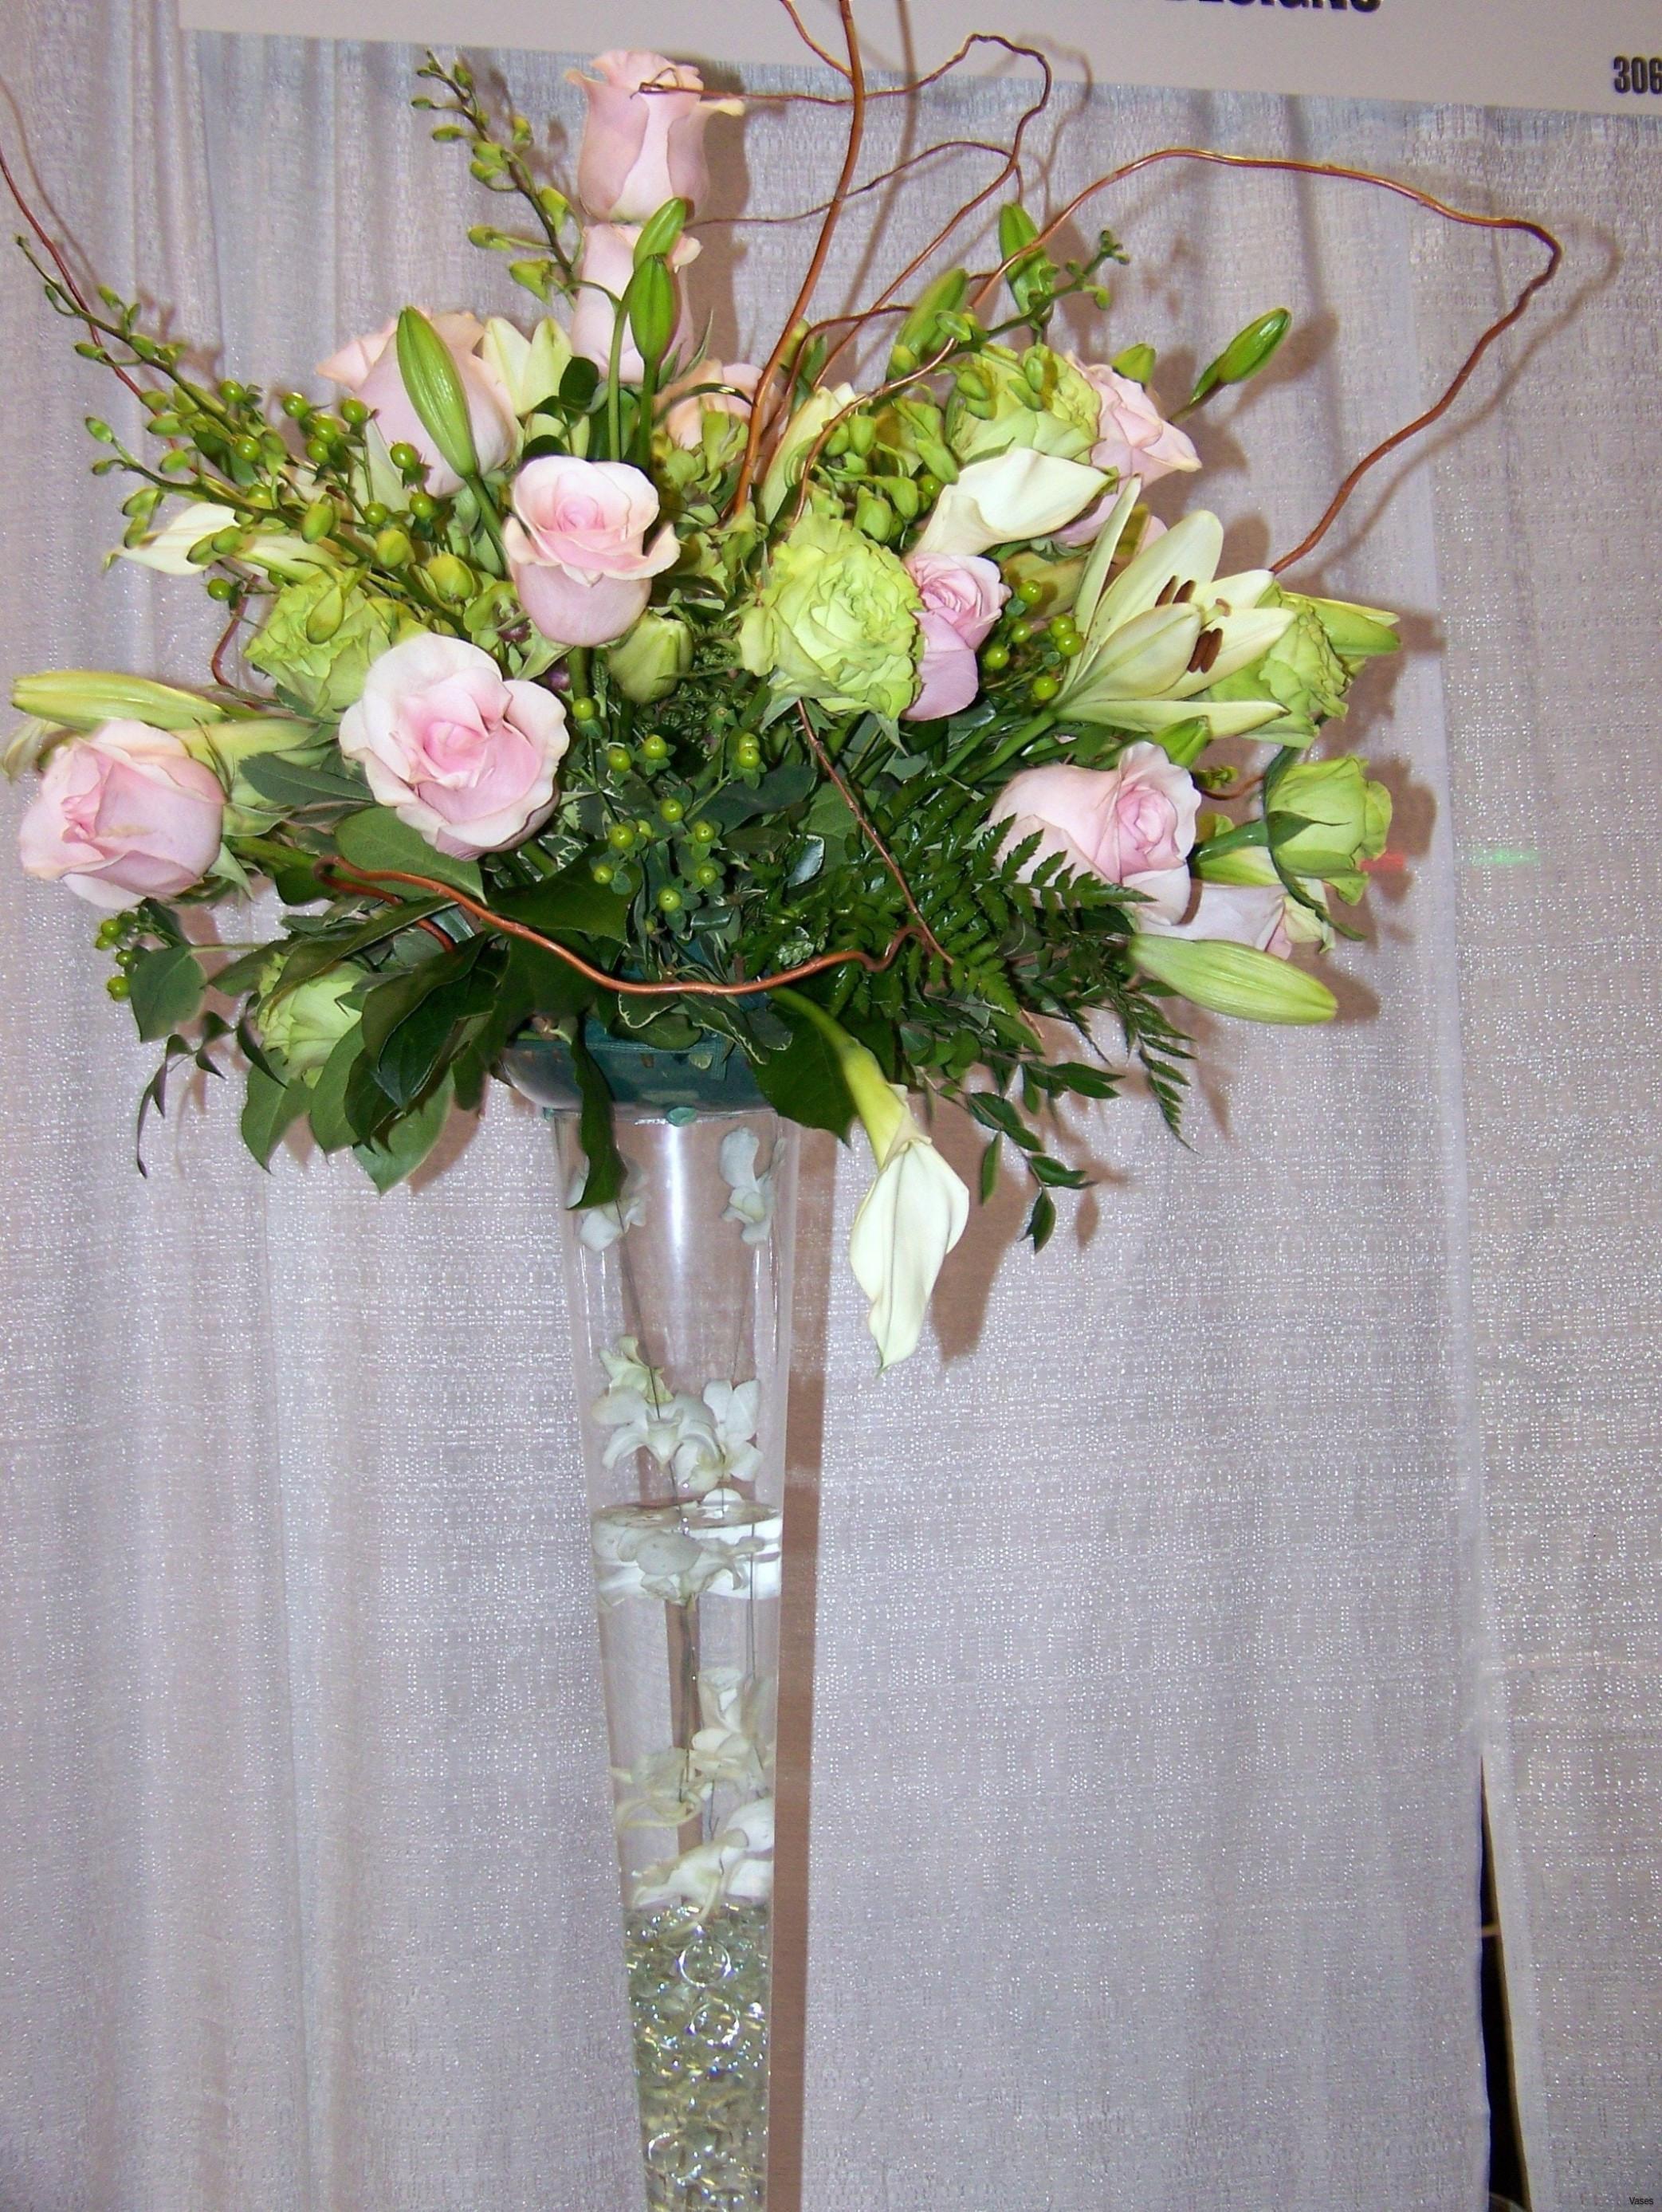 home goods flower vases of diy wedding decor ideas new floral decor for home beautiful decor with regard to diy wedding decor ideas inspirational h vases ideas for floral arrangements in i 0d design ideas